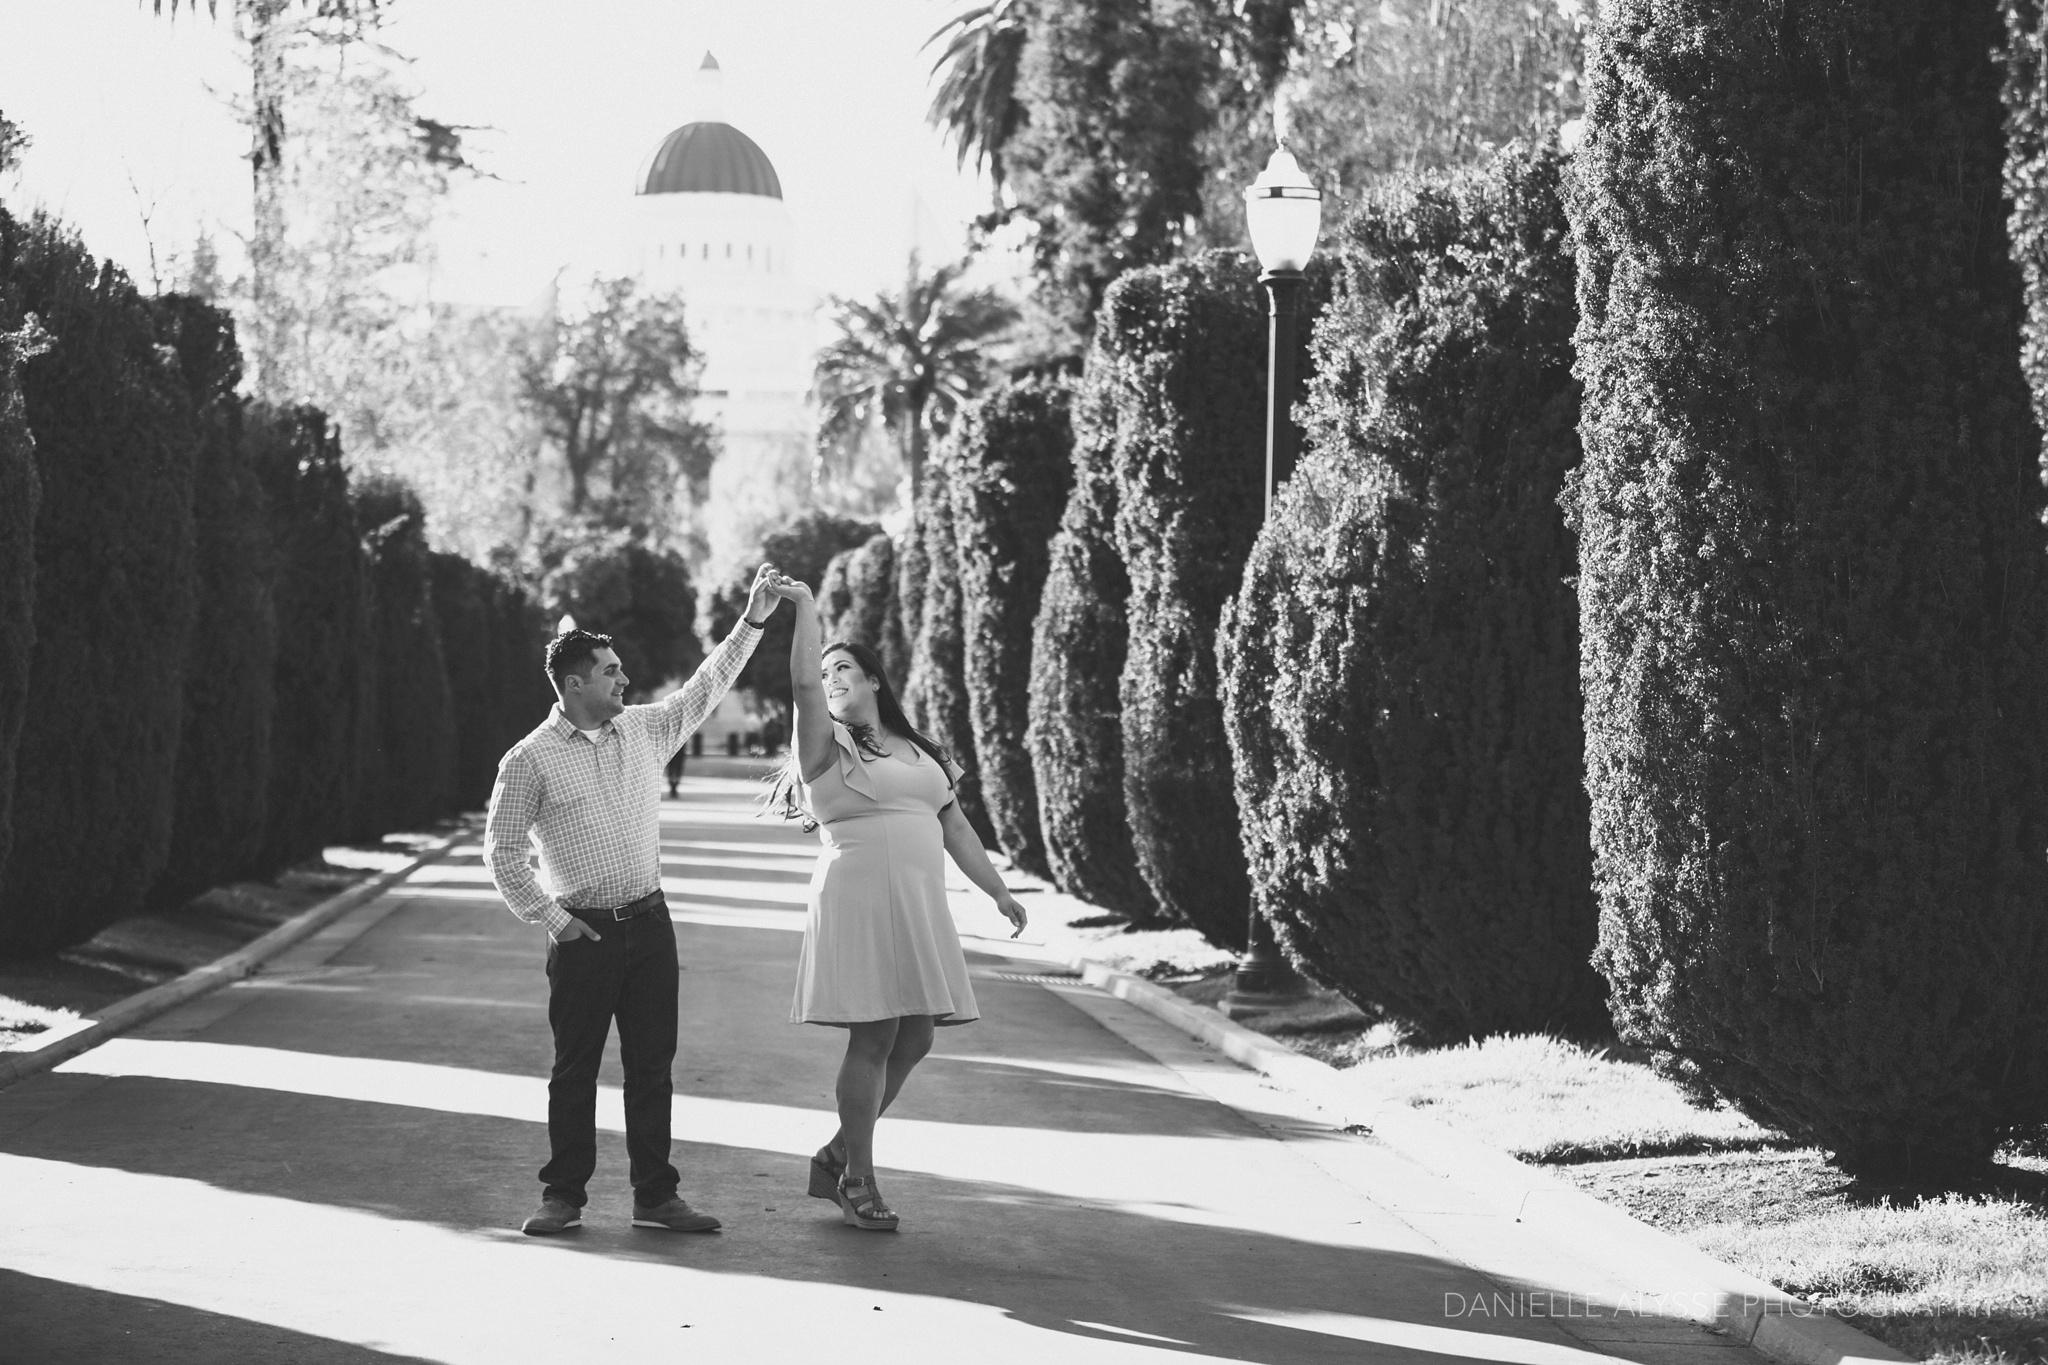 180324_engagement_lily_danielle_alysse_photography_downtown_sacramento_wedding_photographer_blog_25_WEB.jpg